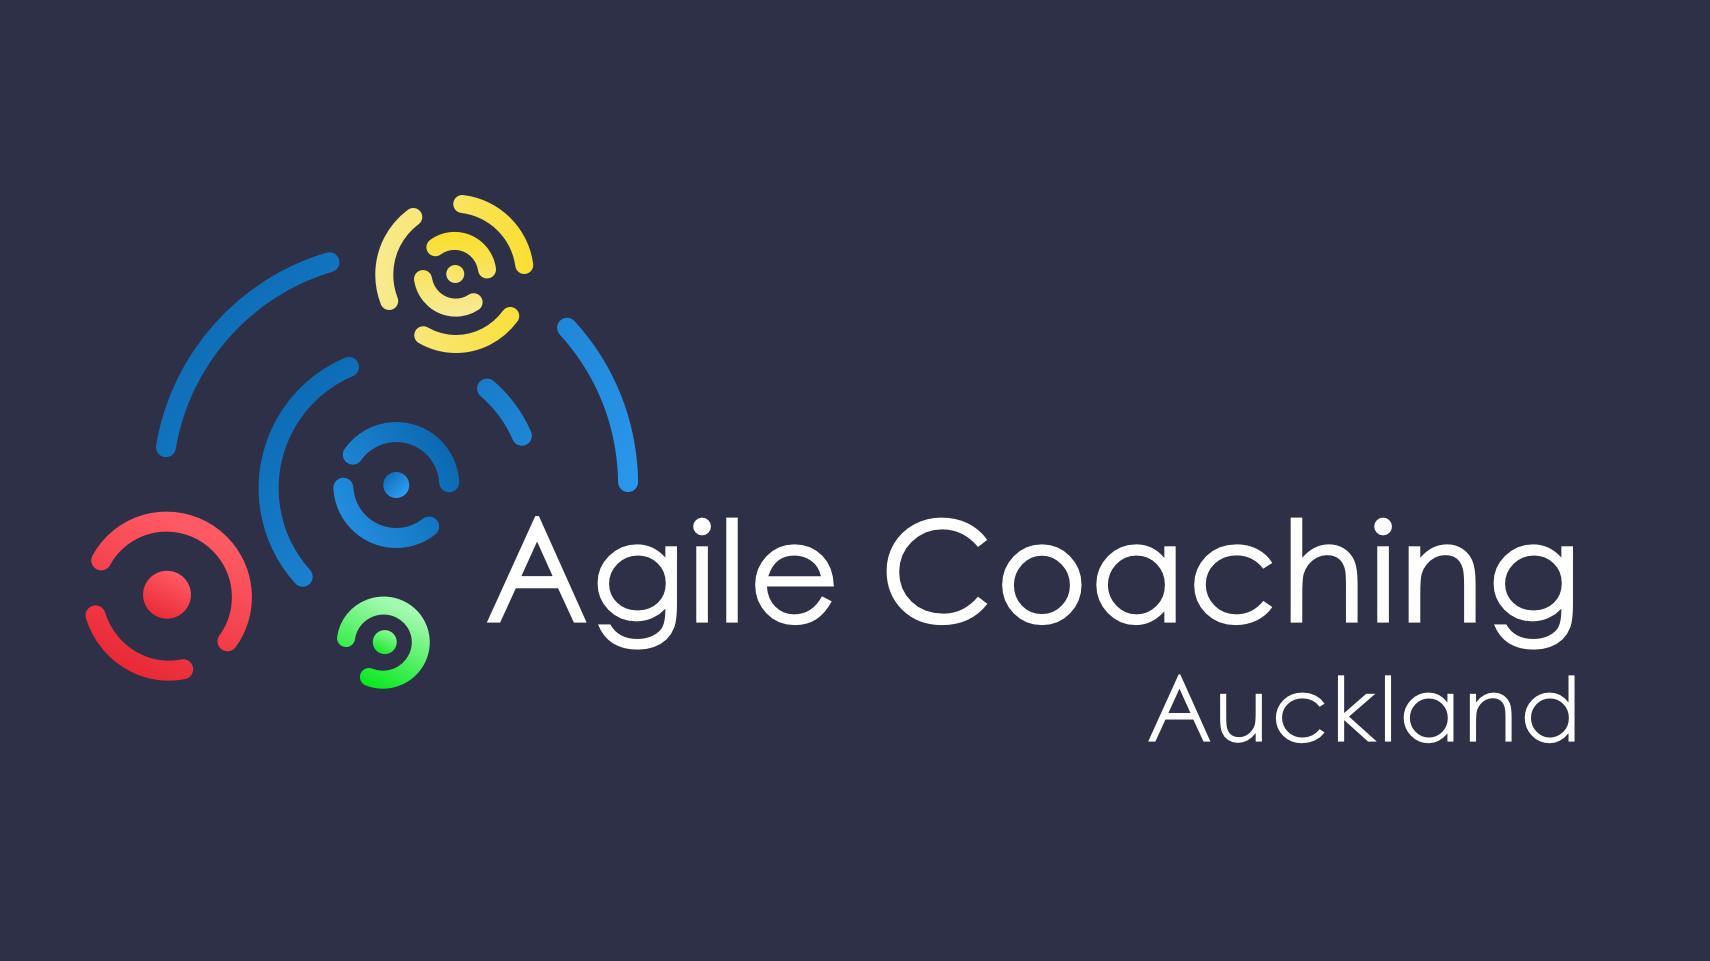 Auckland Agile Coaching Meetup